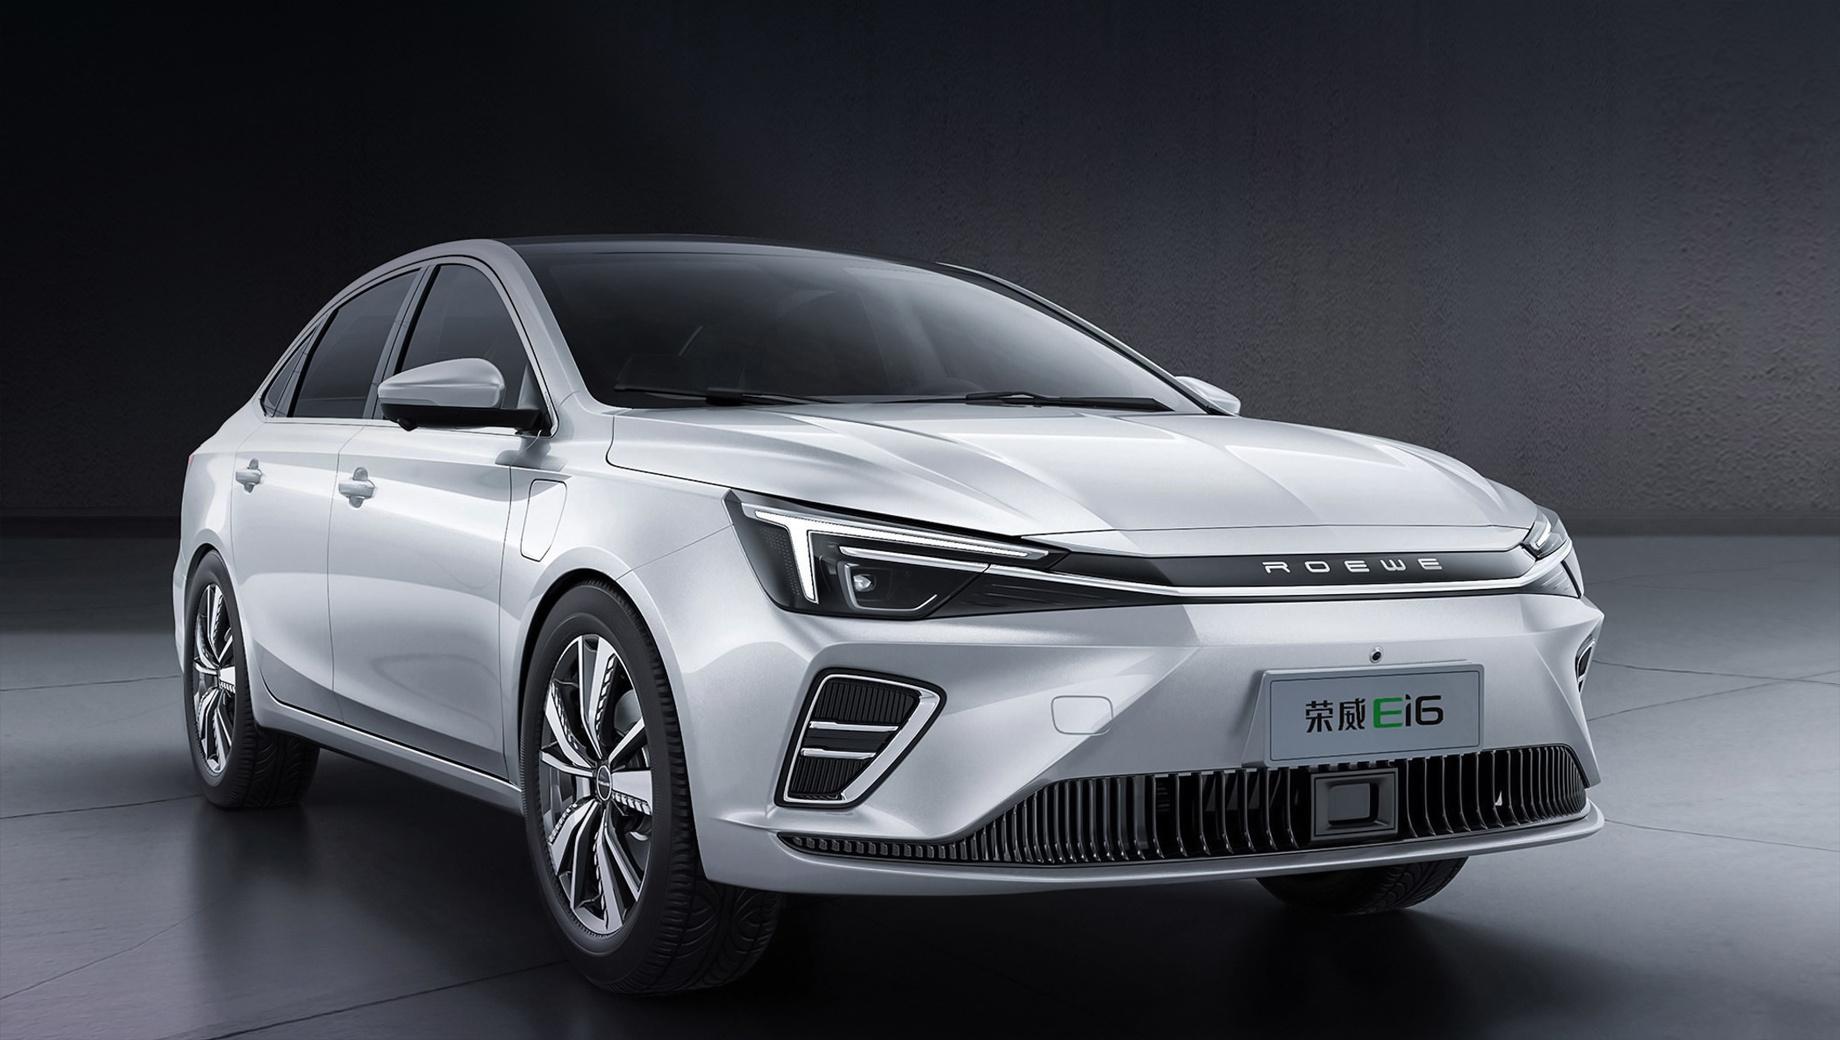 Китайский седан Roewe i6 перевели на электротягу